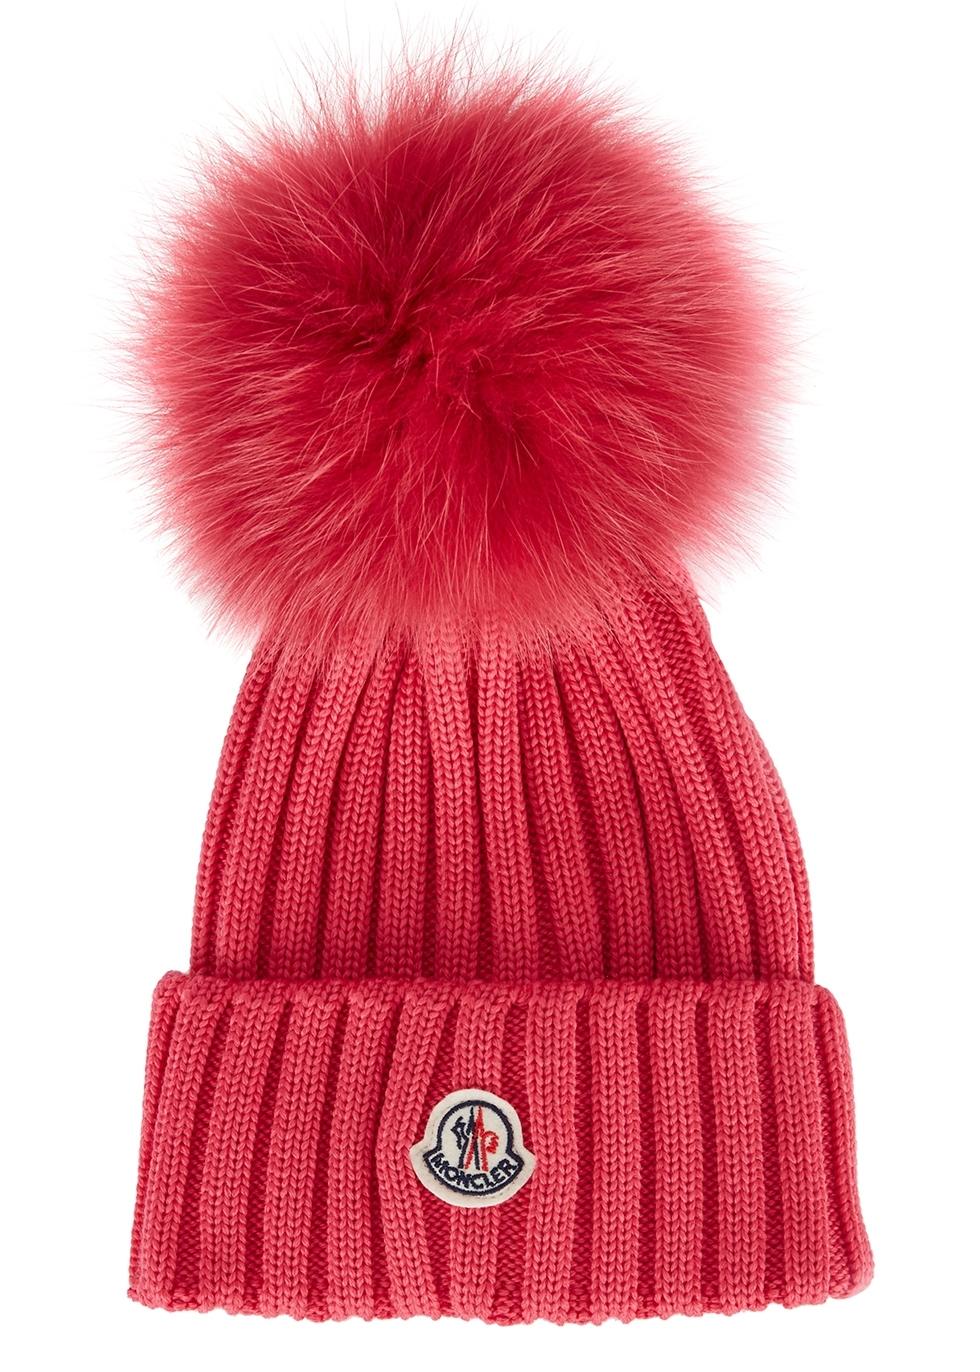 d3edce483a8 Designer Beanies - Women s Luxury Hats - Harvey Nichols